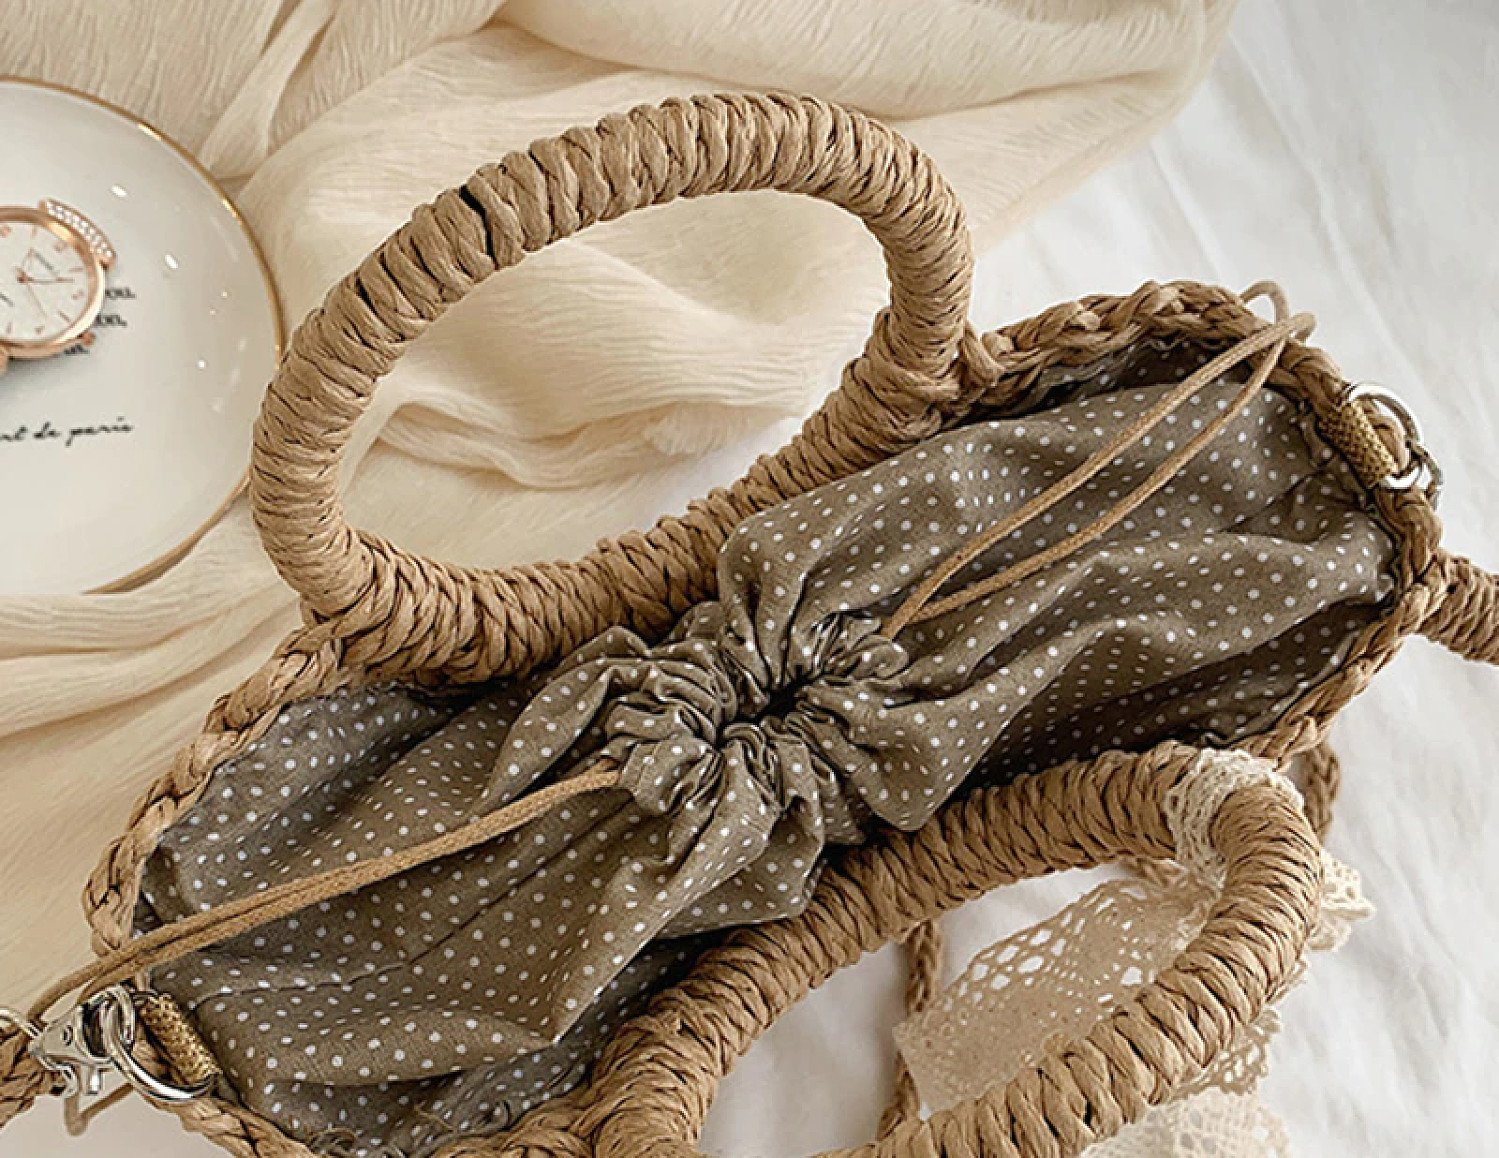 Hand Woven Straw Bag